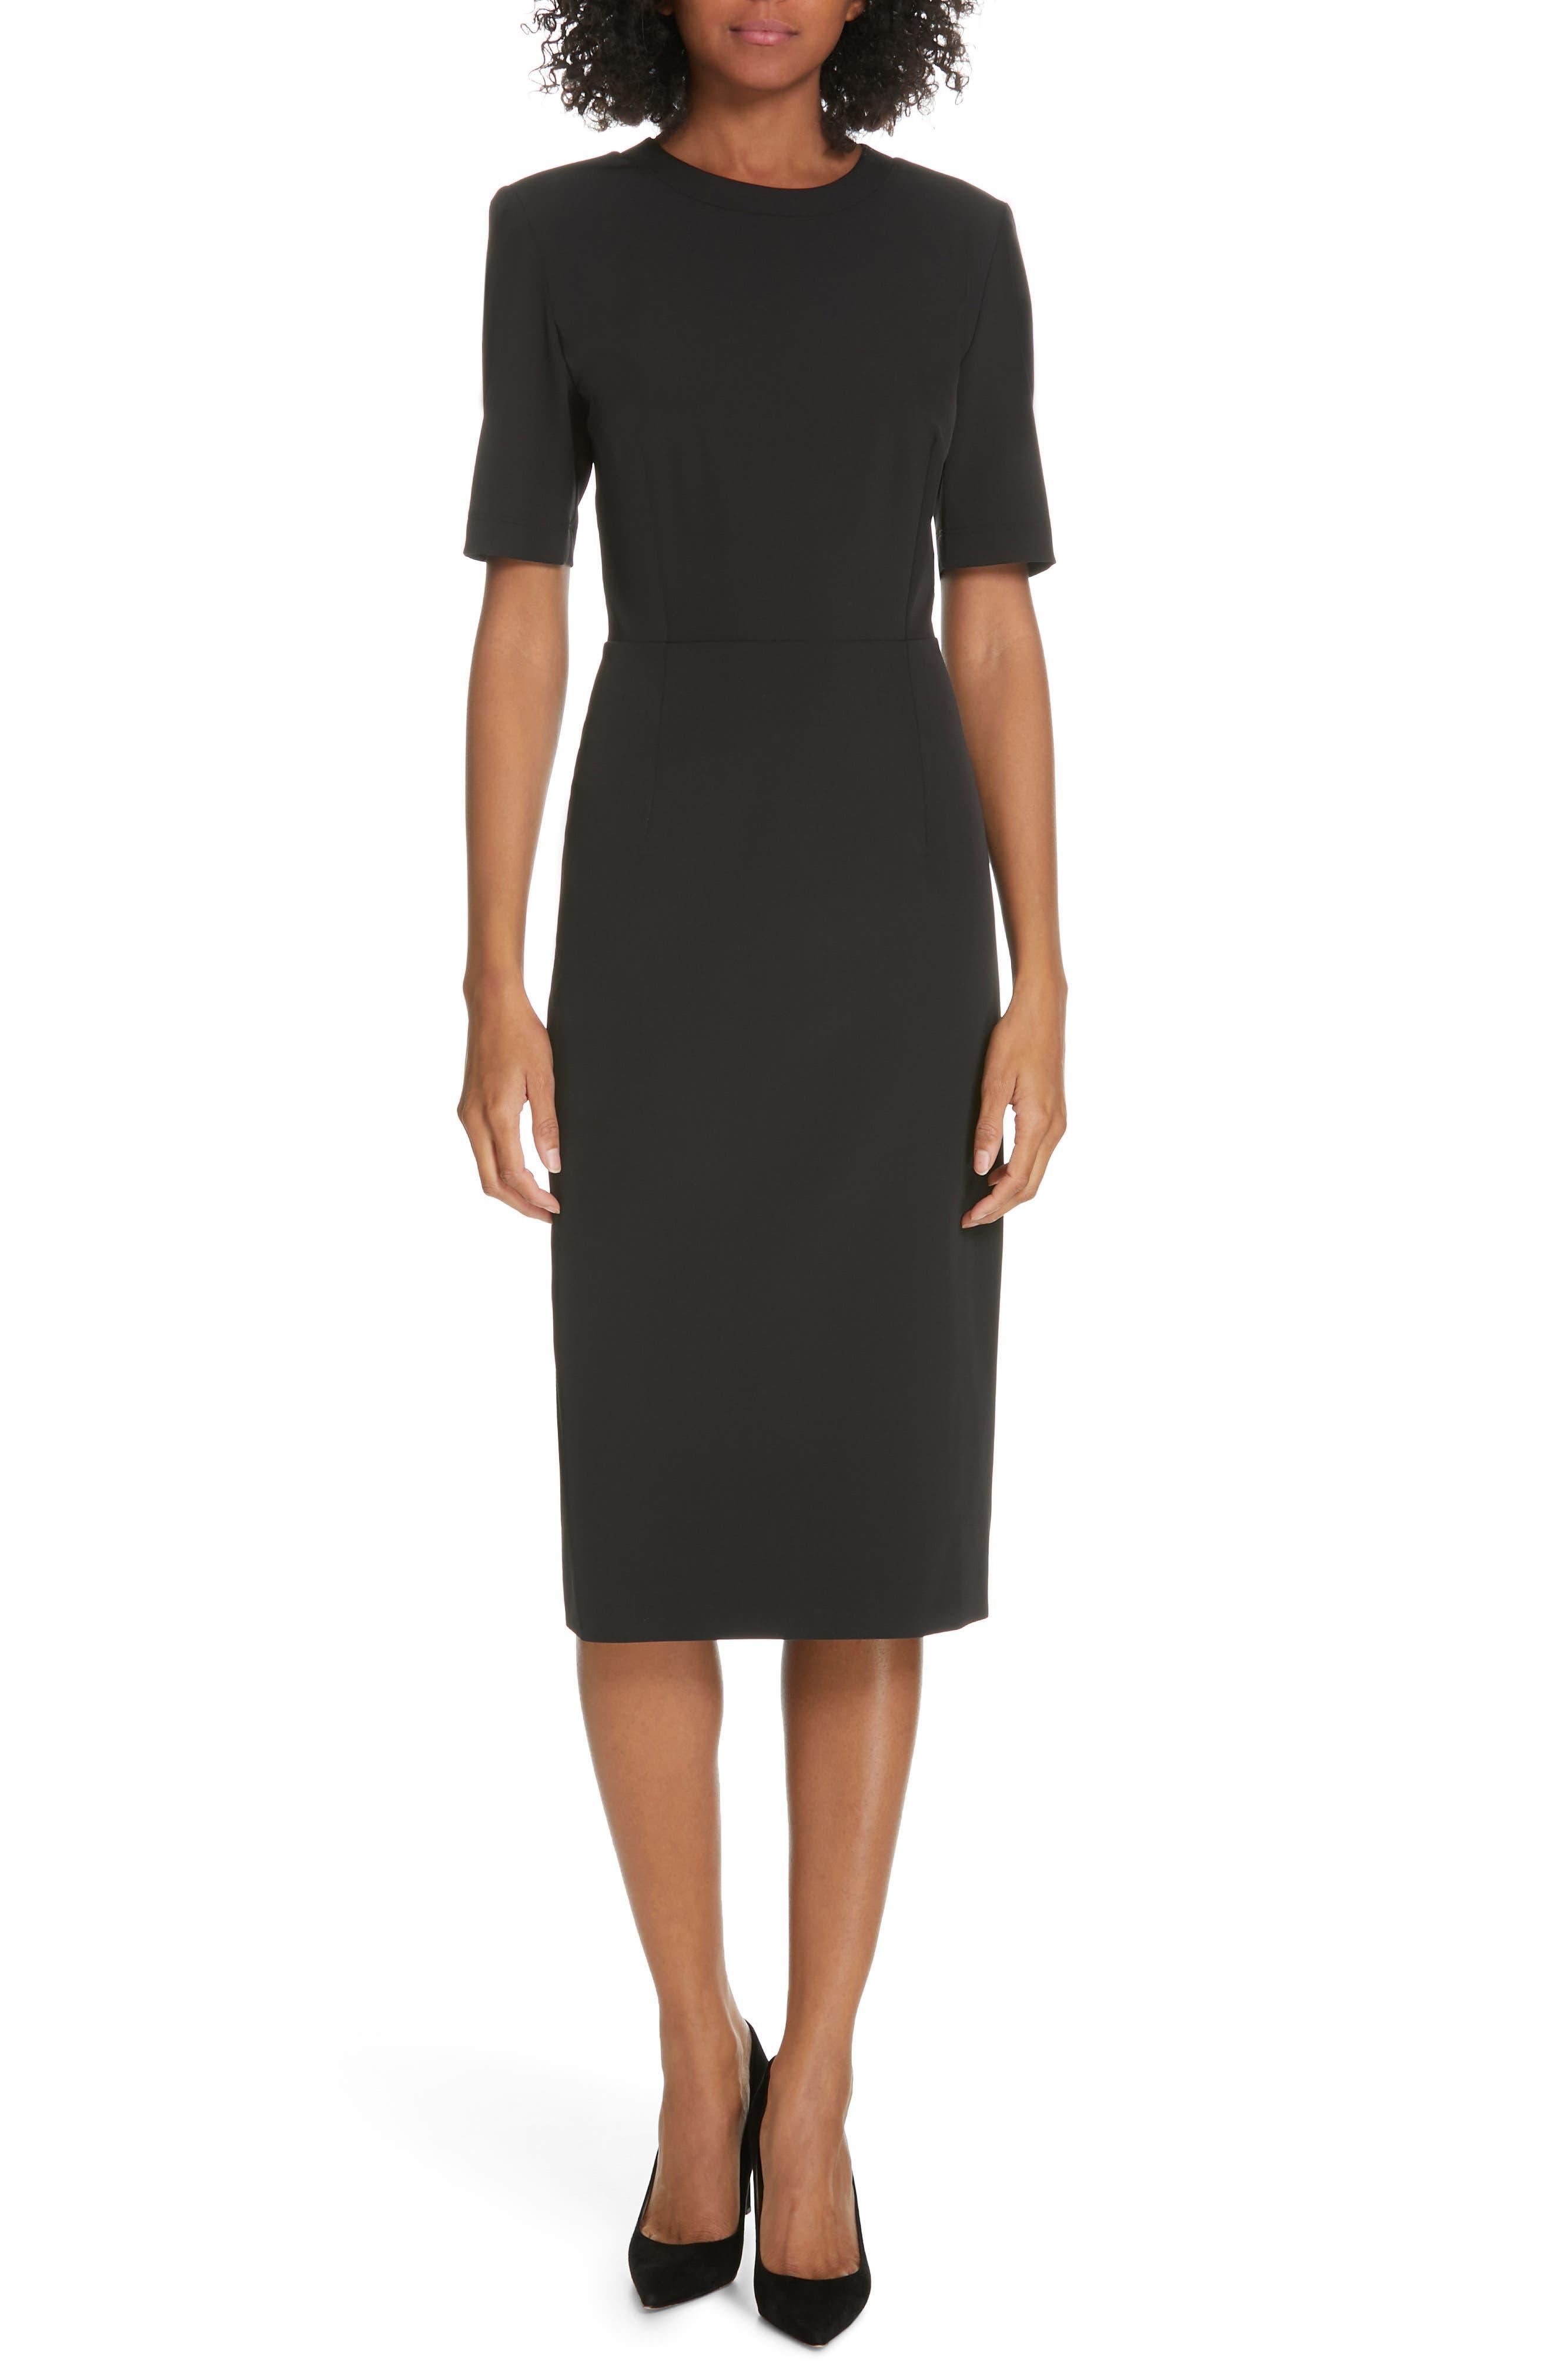 Judith & Charles Construct Dress, Black